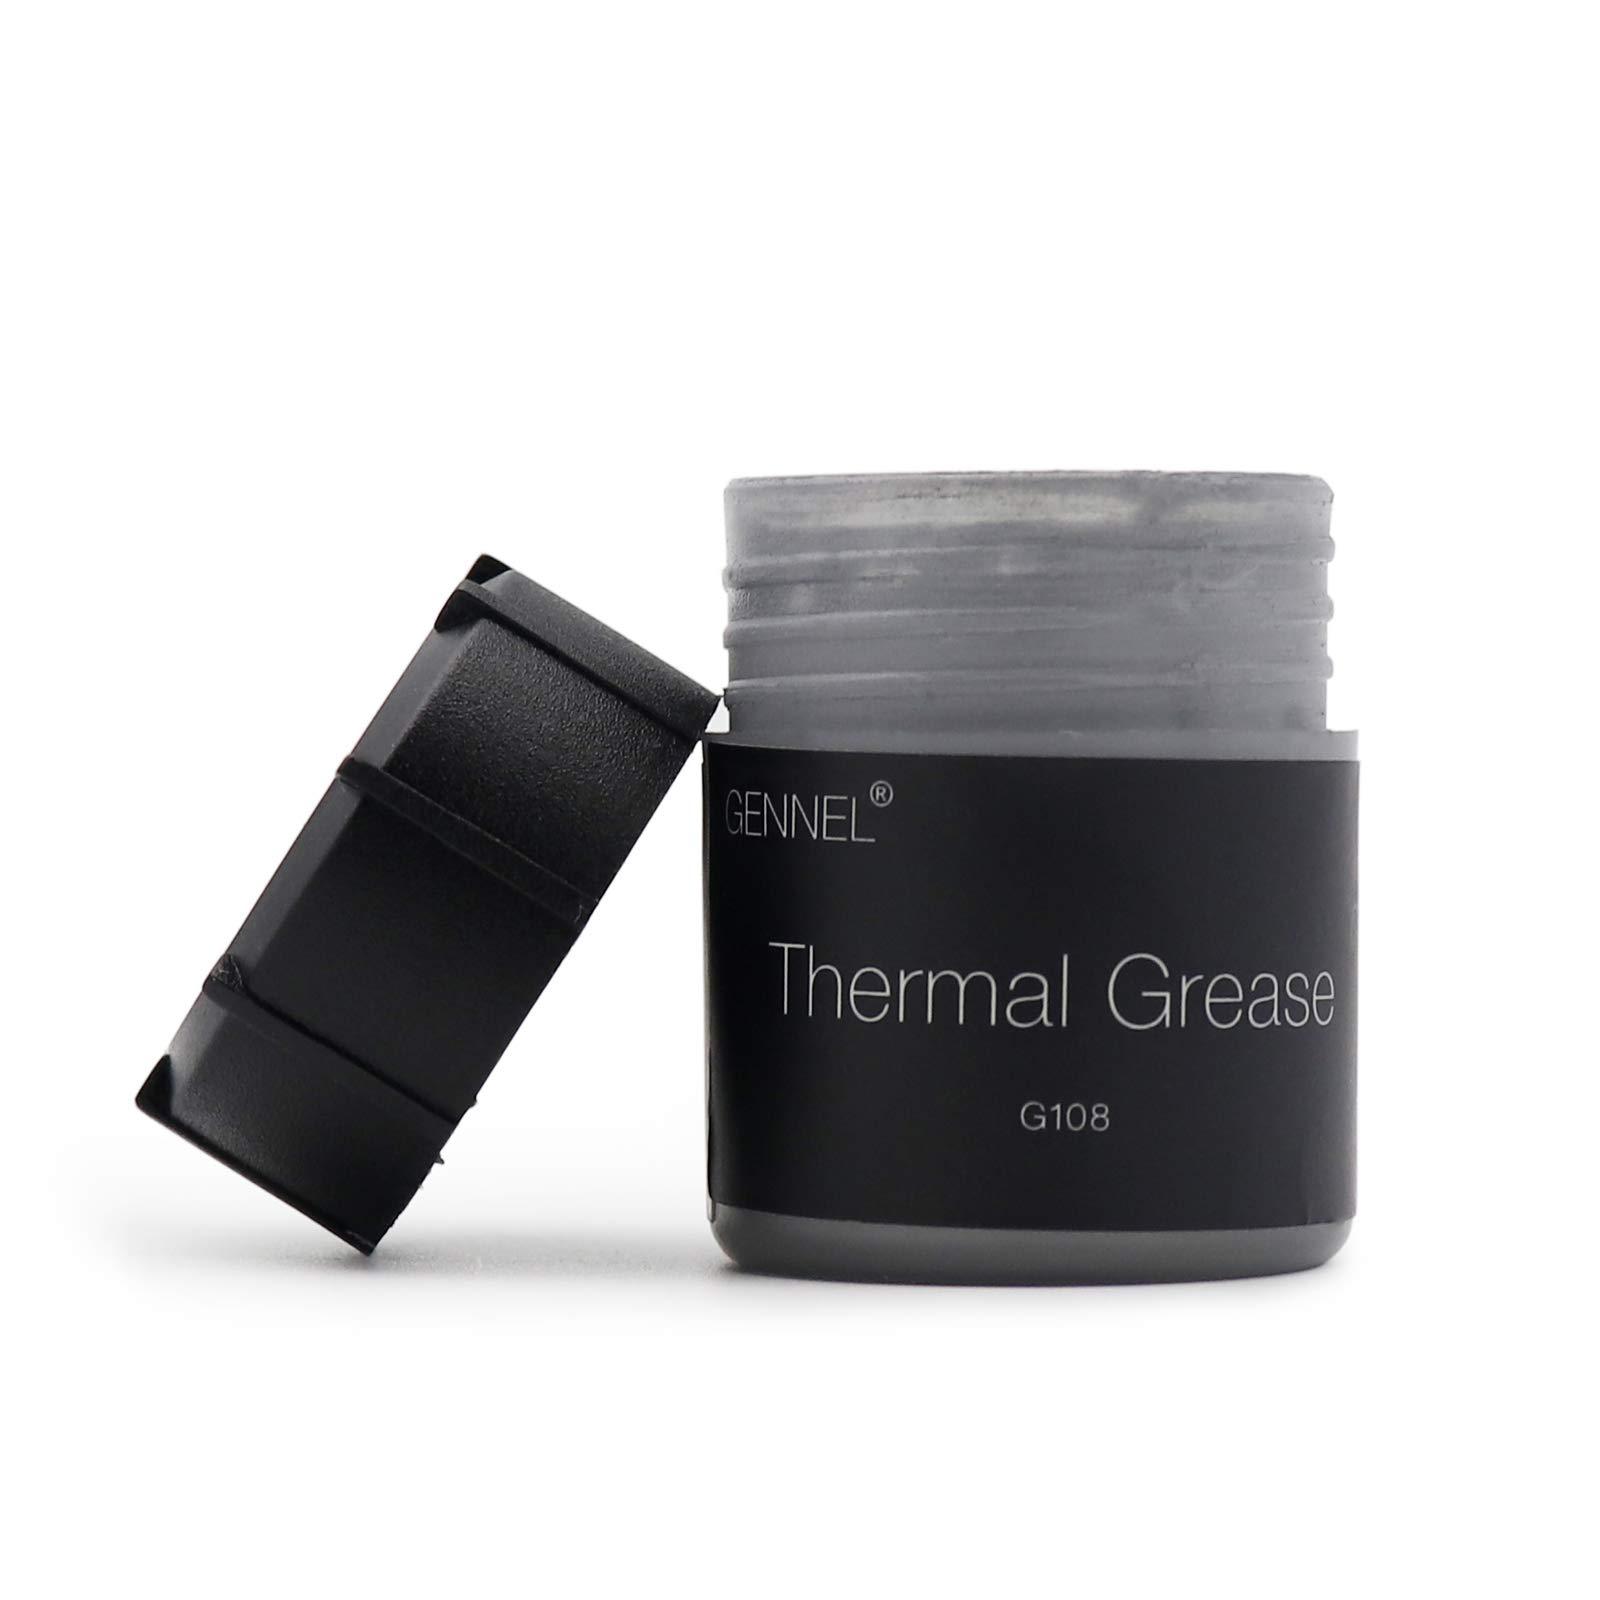 Grasa térmica para procesador, CPU, coolers 20g. Base carbon